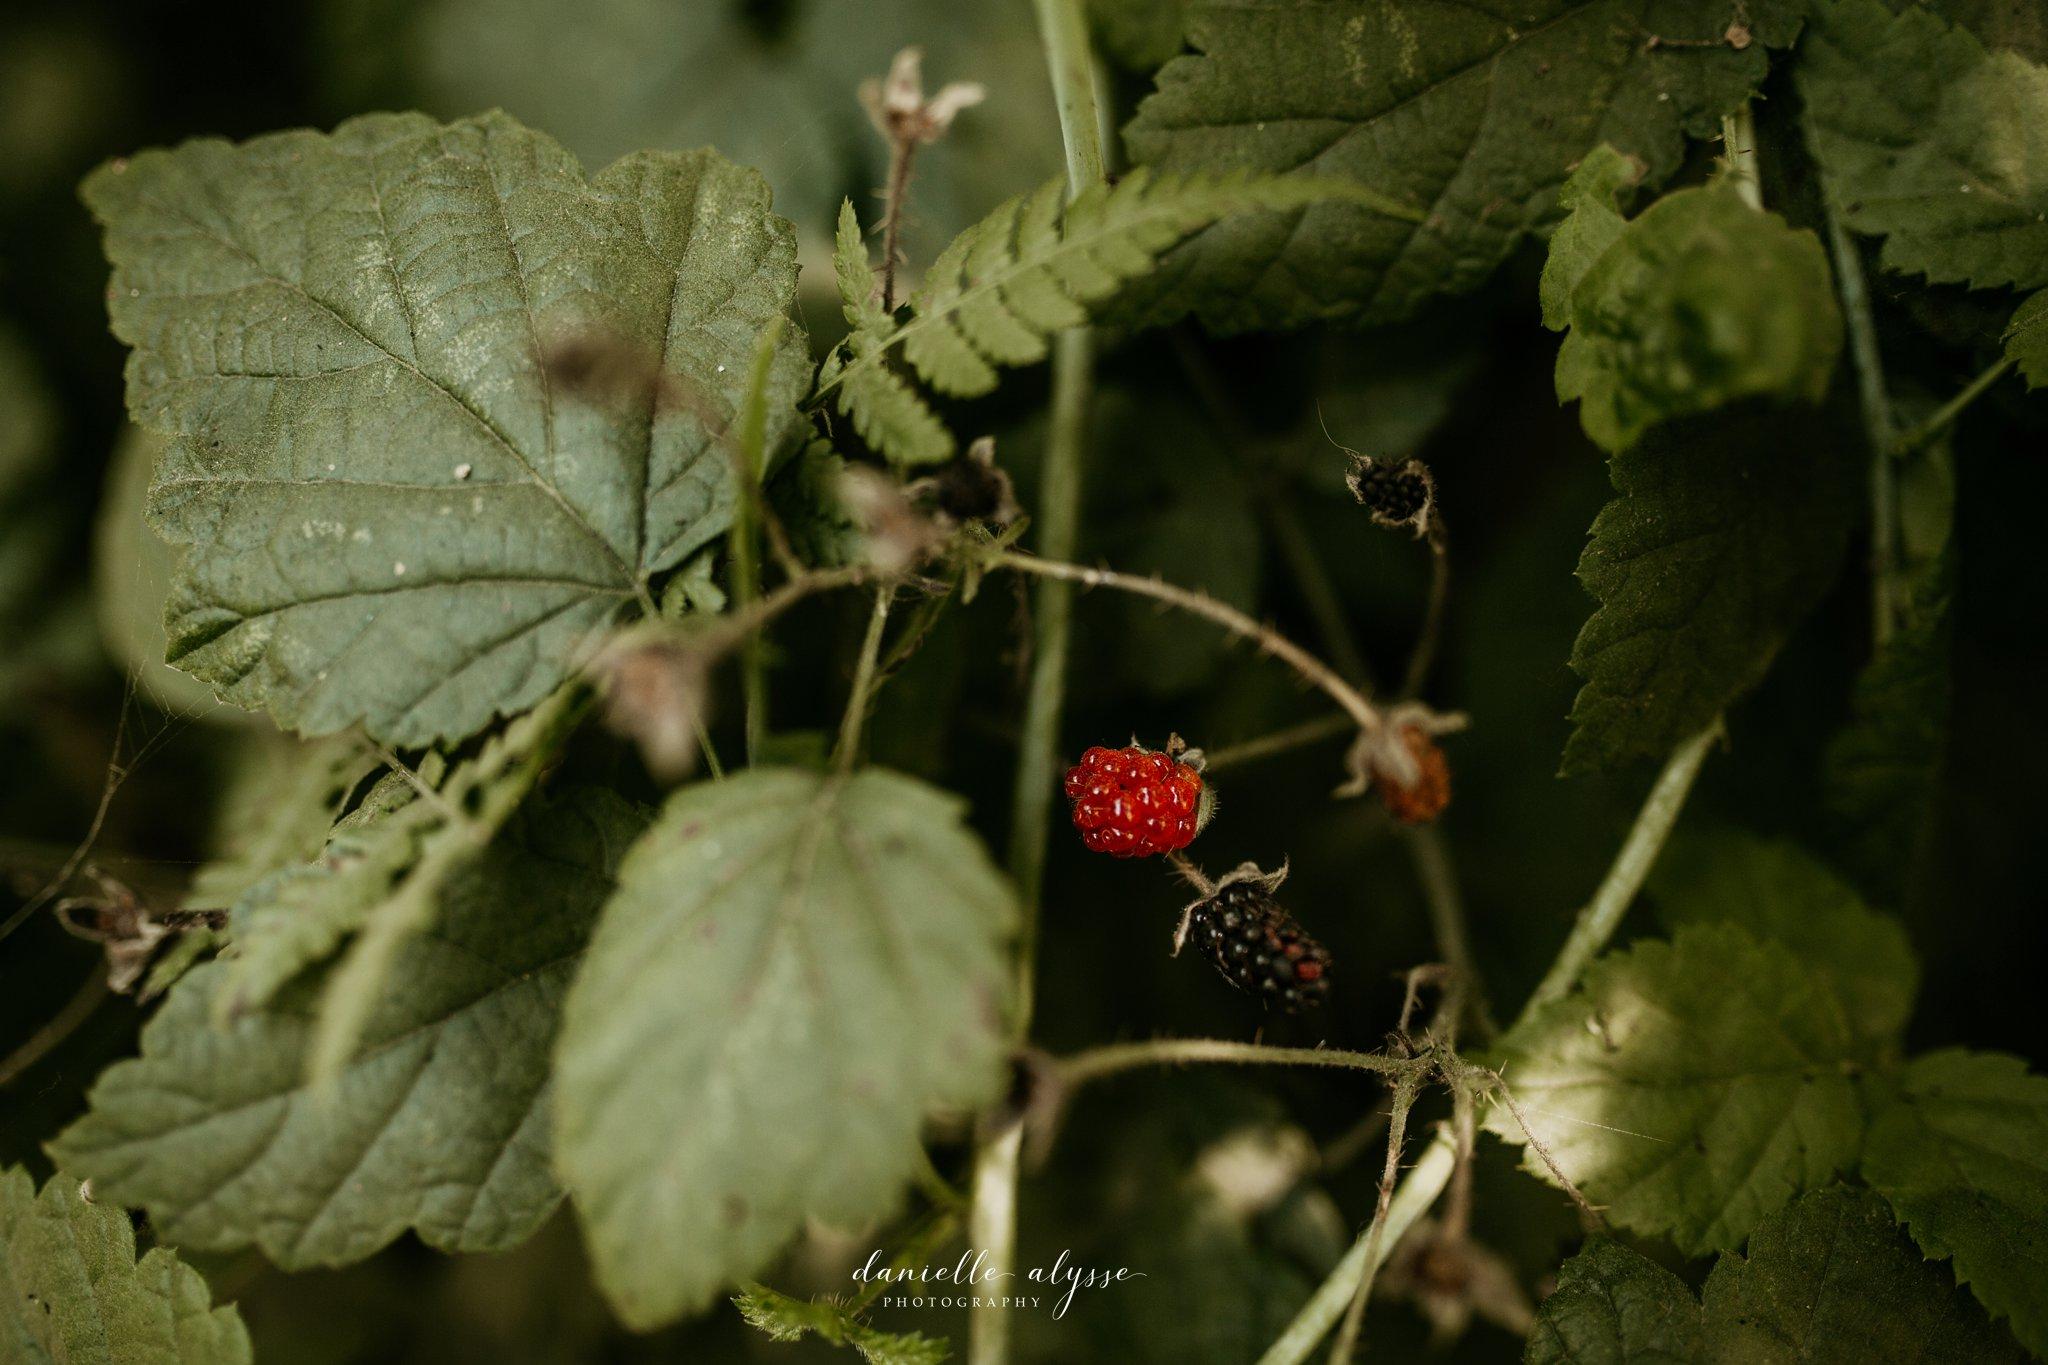 180720_travel_washington_destination_seattle_danielle_alysse_photography_blog_218_WEB.jpg